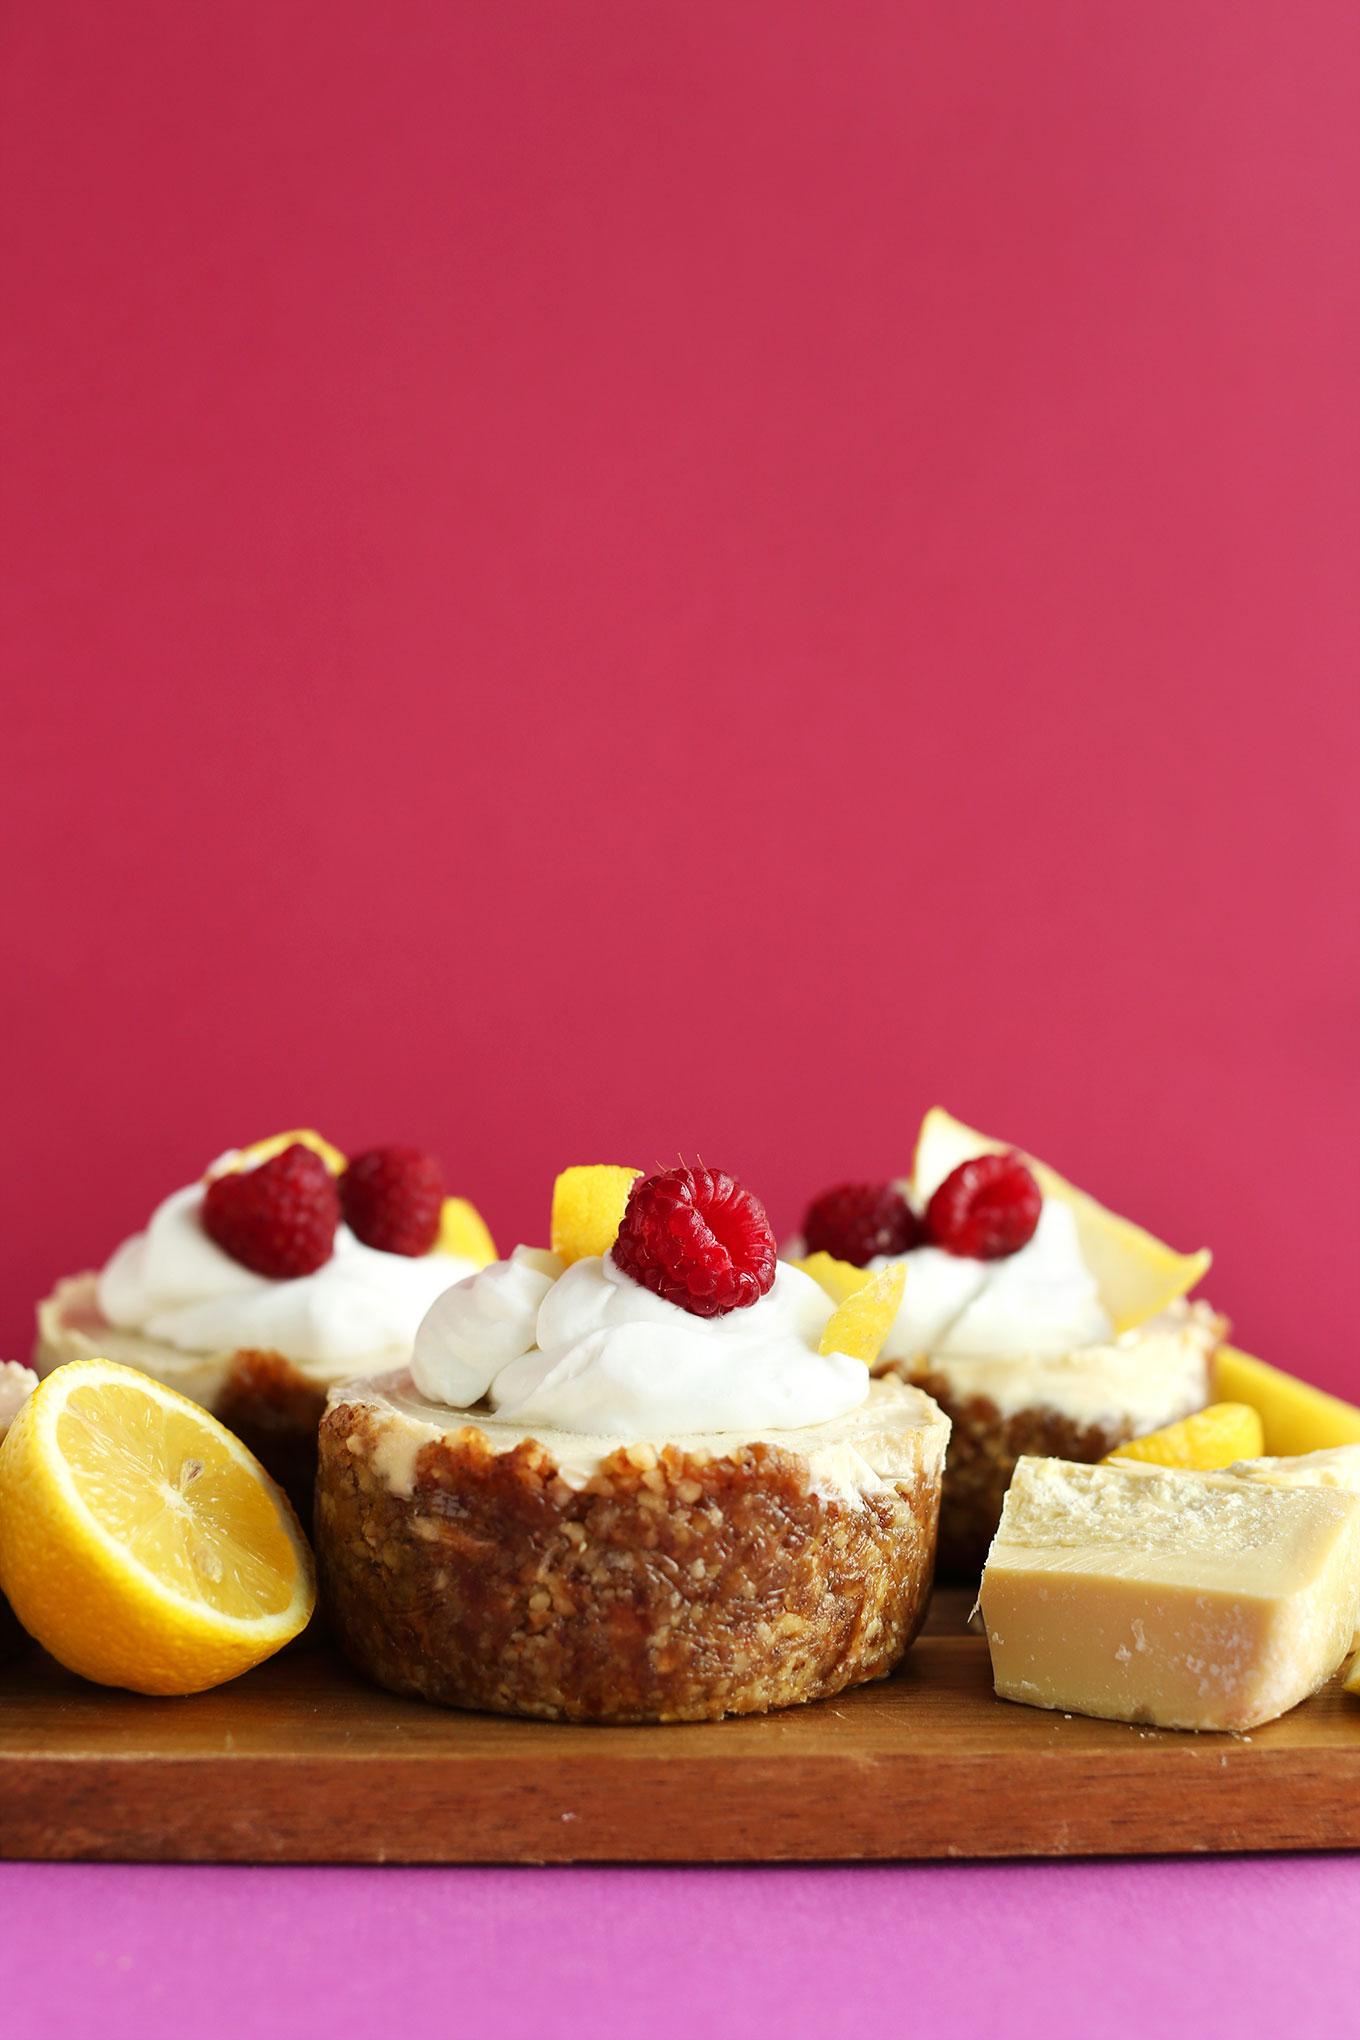 AMAZING Lemon White Chocolate Cheesecakes with Walnut-Date Crust! 1 Blender, Naturally sweetened, SO delicious! #vegan #glutenfree #minimalistbaker